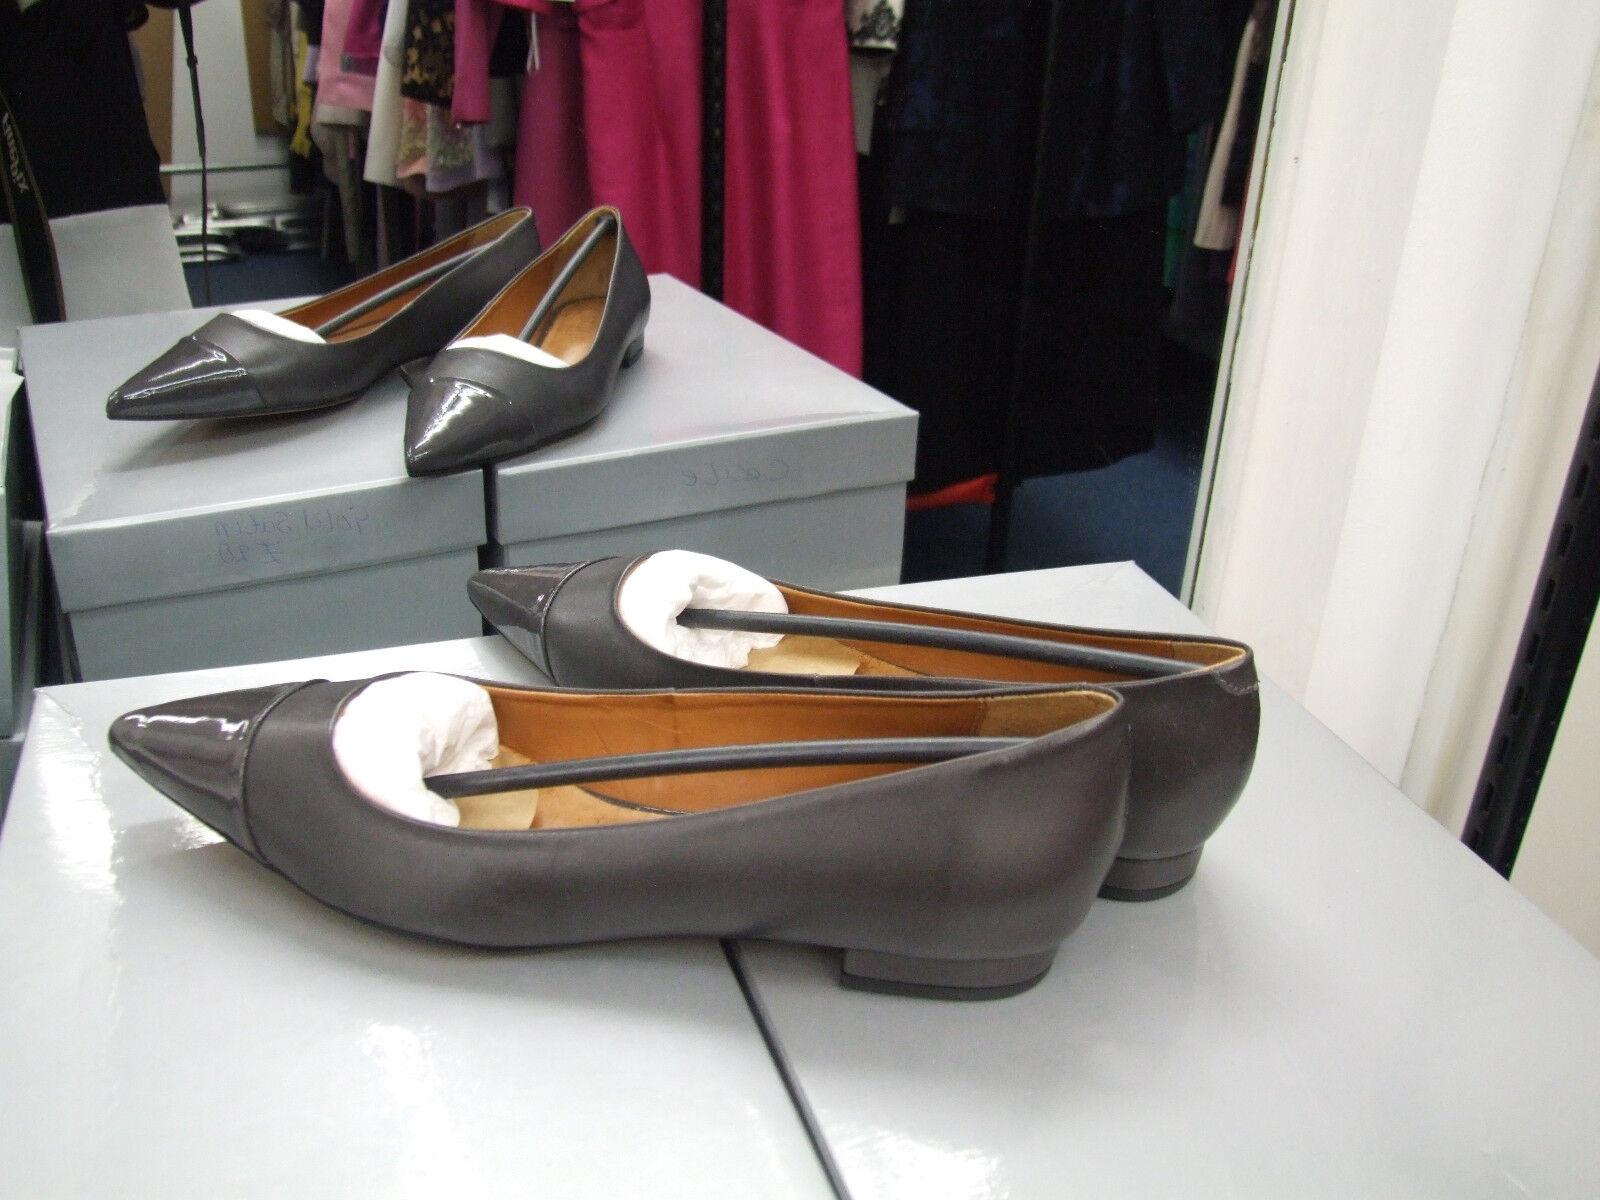 Cecille bnib uk 7 divine gris cuir talon bas mocassins loafers chaussures eu 40 neuf